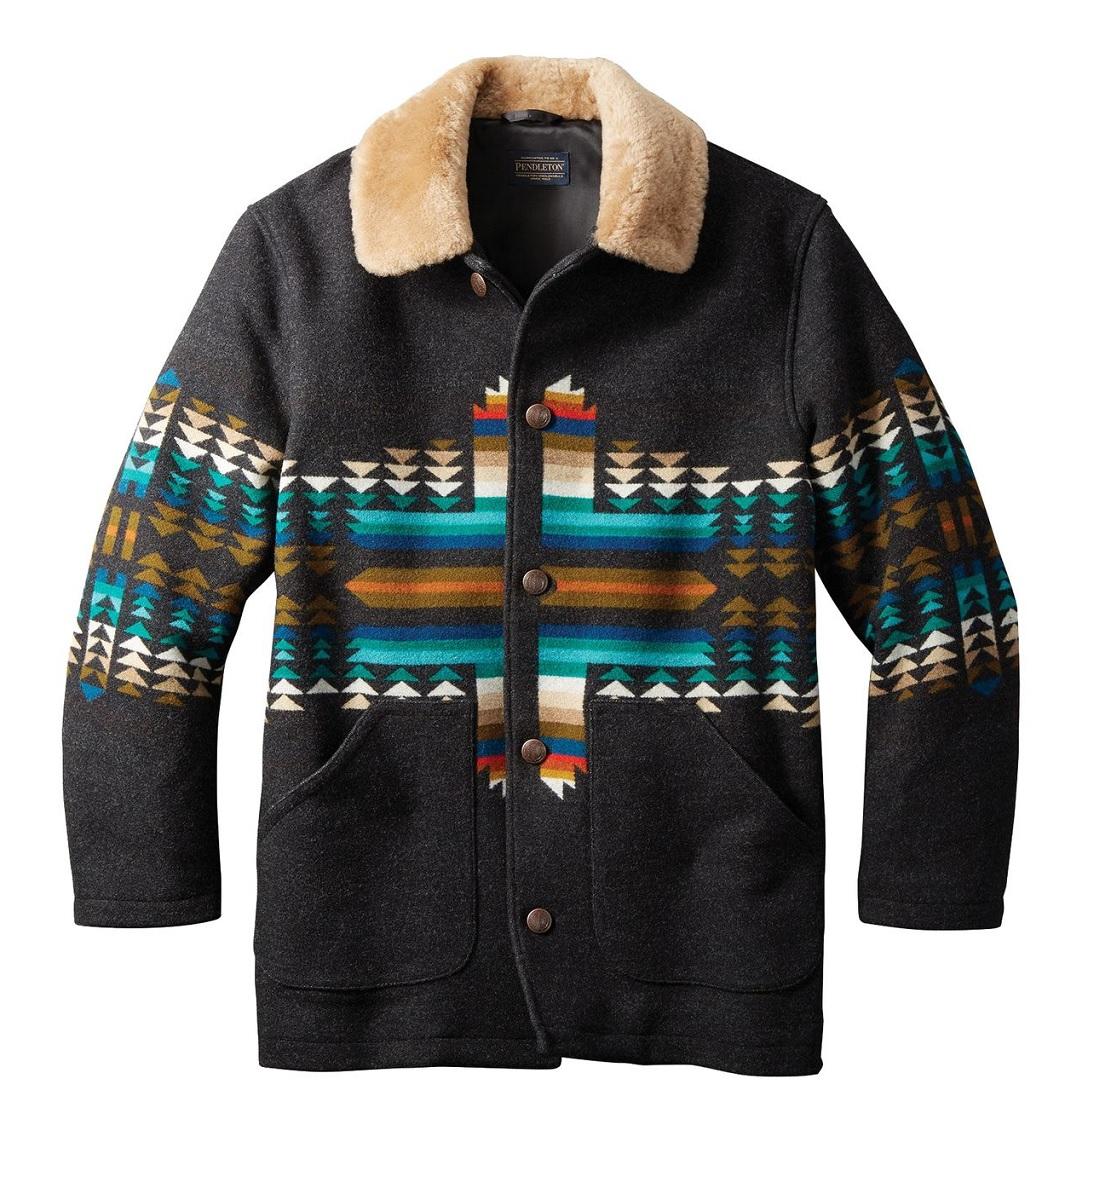 PENDLETON (ペンドルトン) Pendleton Brownsville Shearling Collar Coat/ブラウンズビル シャーリング カラーコート/メンズ